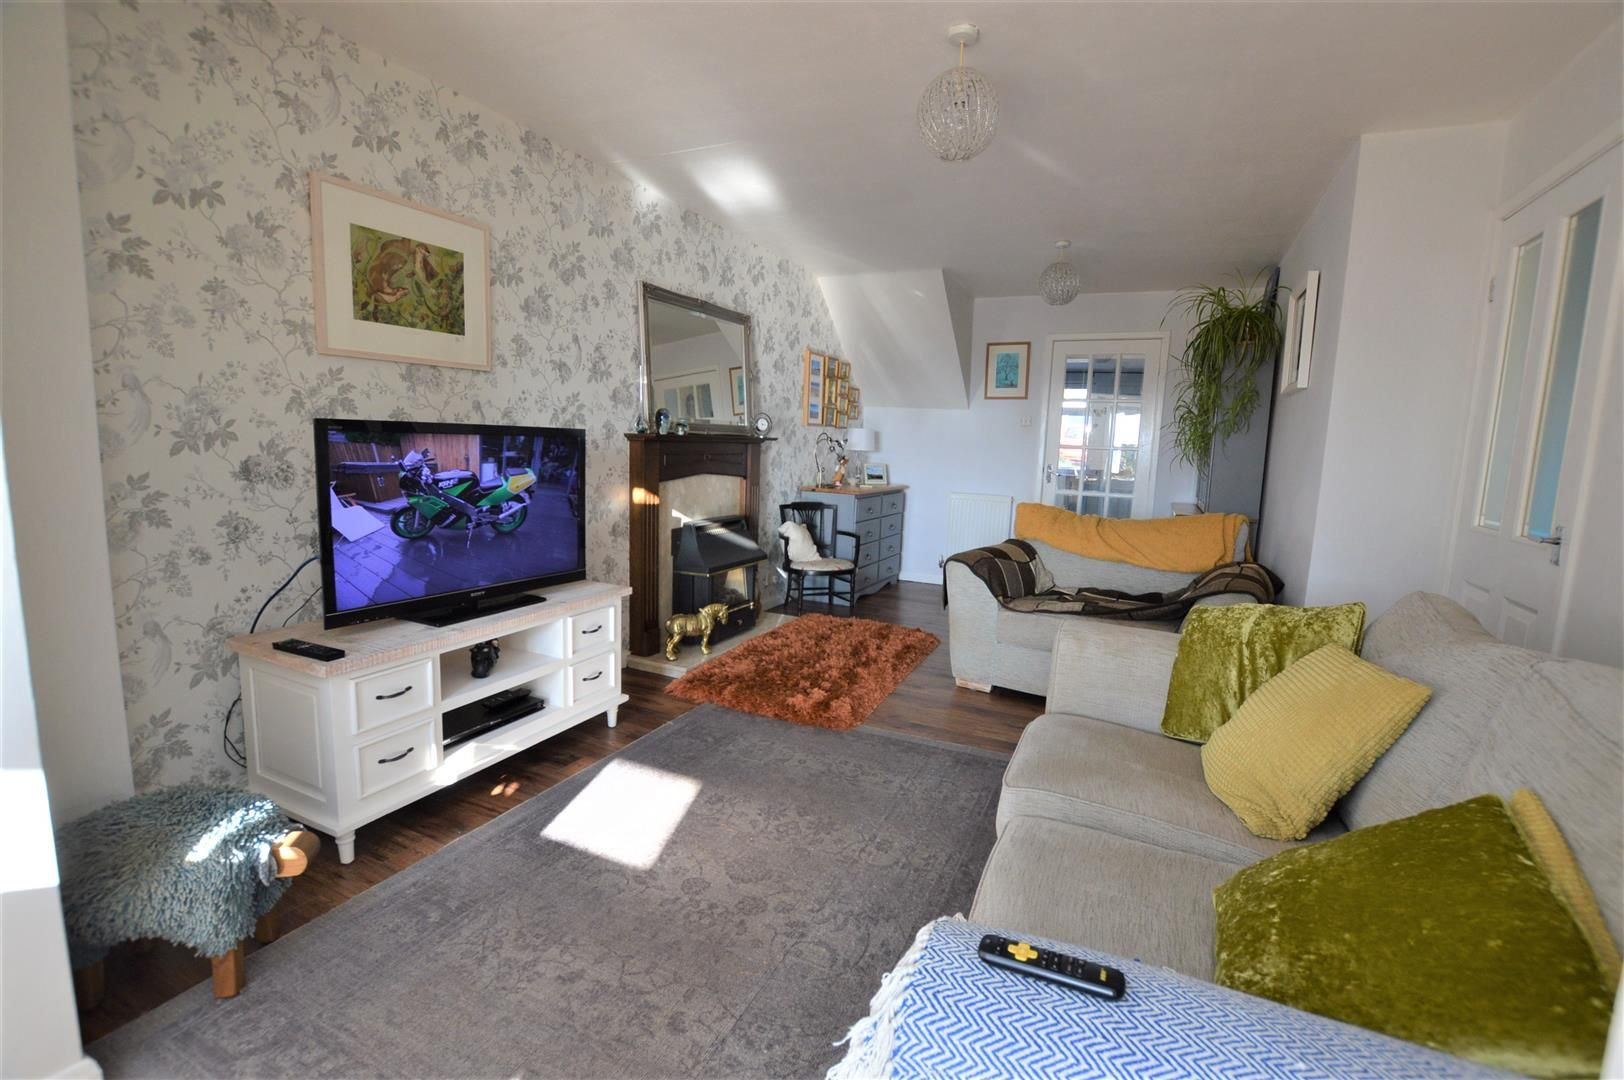 4 bed semi-detached for sale in Bromyard  - Property Image 2